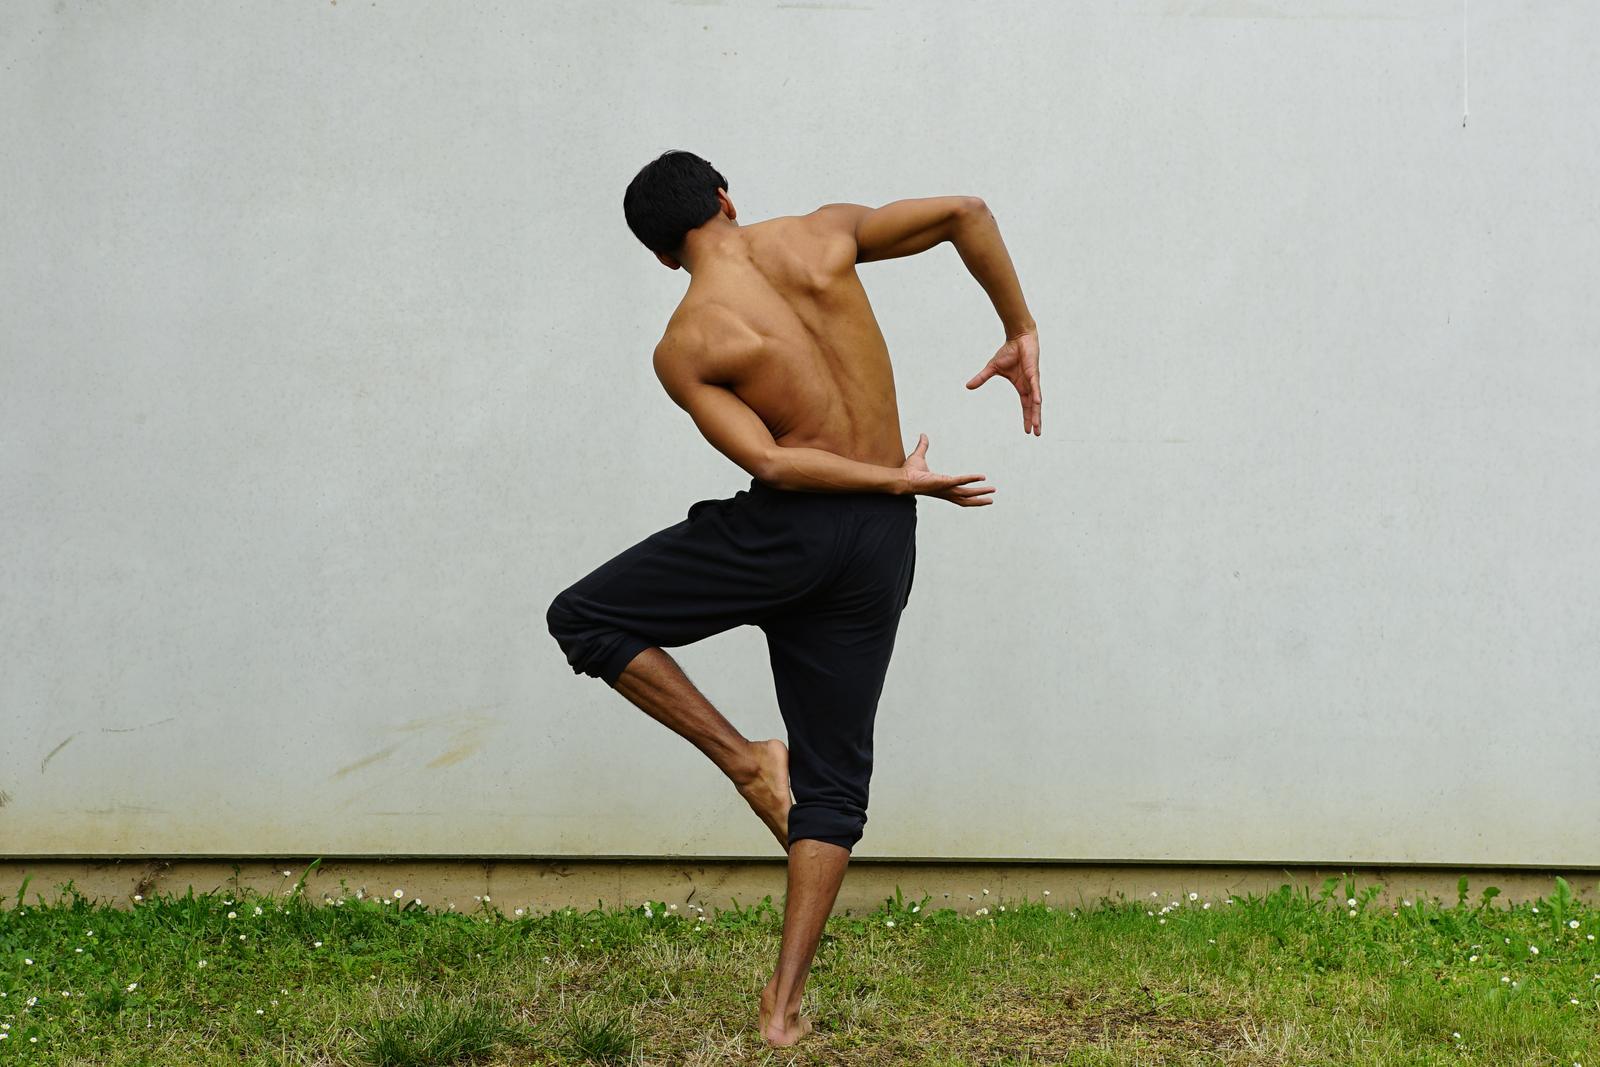 Danse_No made_Marino Vanna_Trois CL_Luxembourg_Pole Sud_Strasbourg_c_Noémie Cordier_szenik